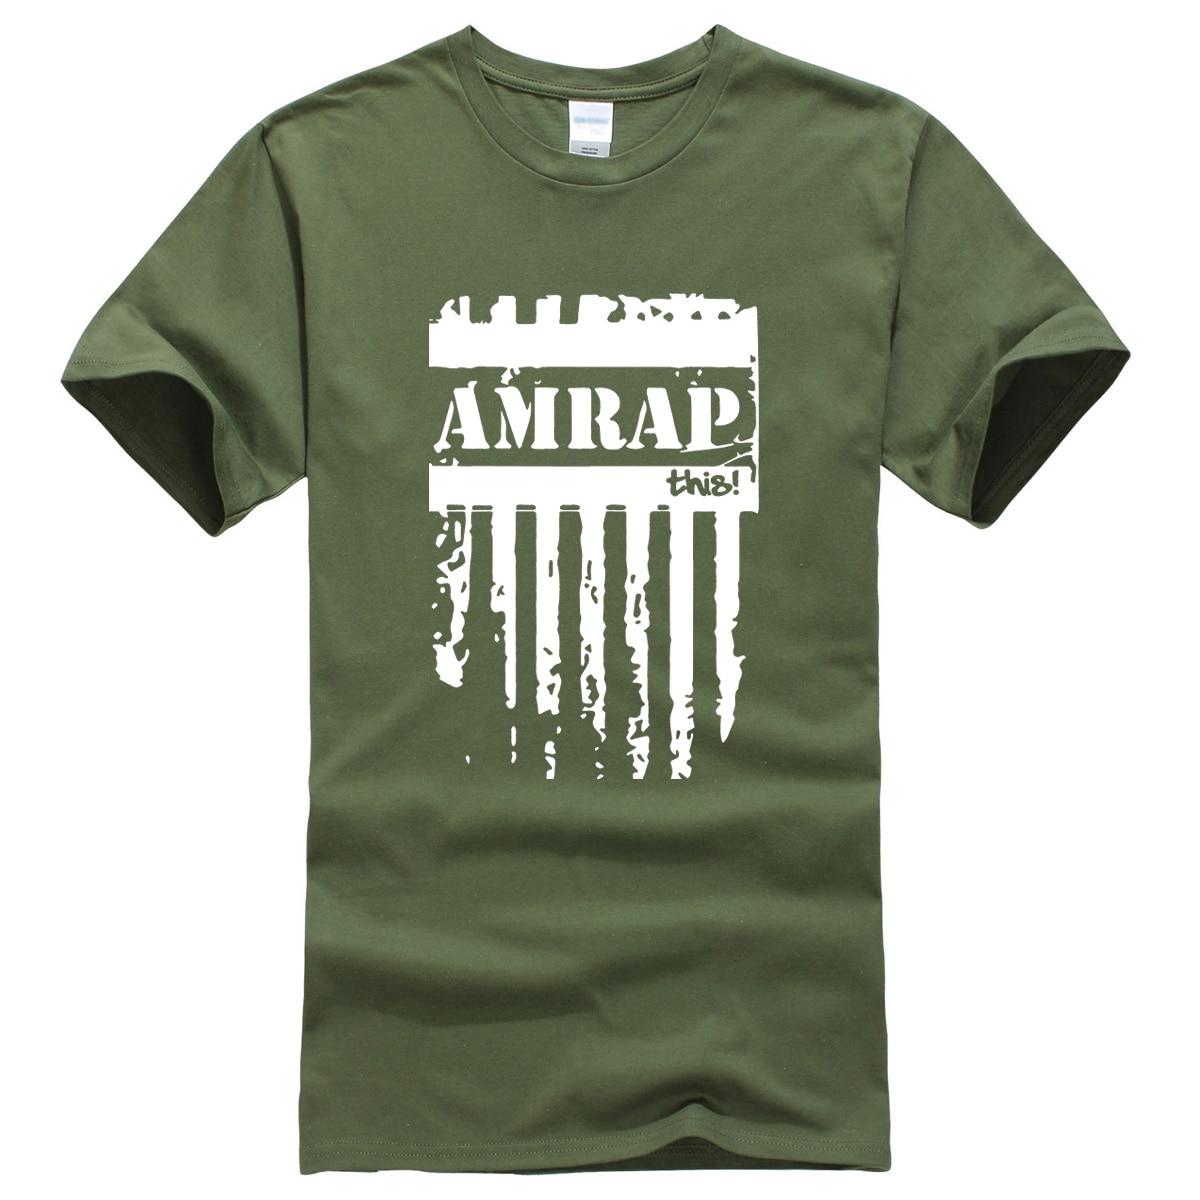 AMRAP Letter Printed 2019 Men's T-shirts Summer Brand Clothing Hip Hop T Shirt For Men Sportswear Fitness Harajuku T-shirt Top